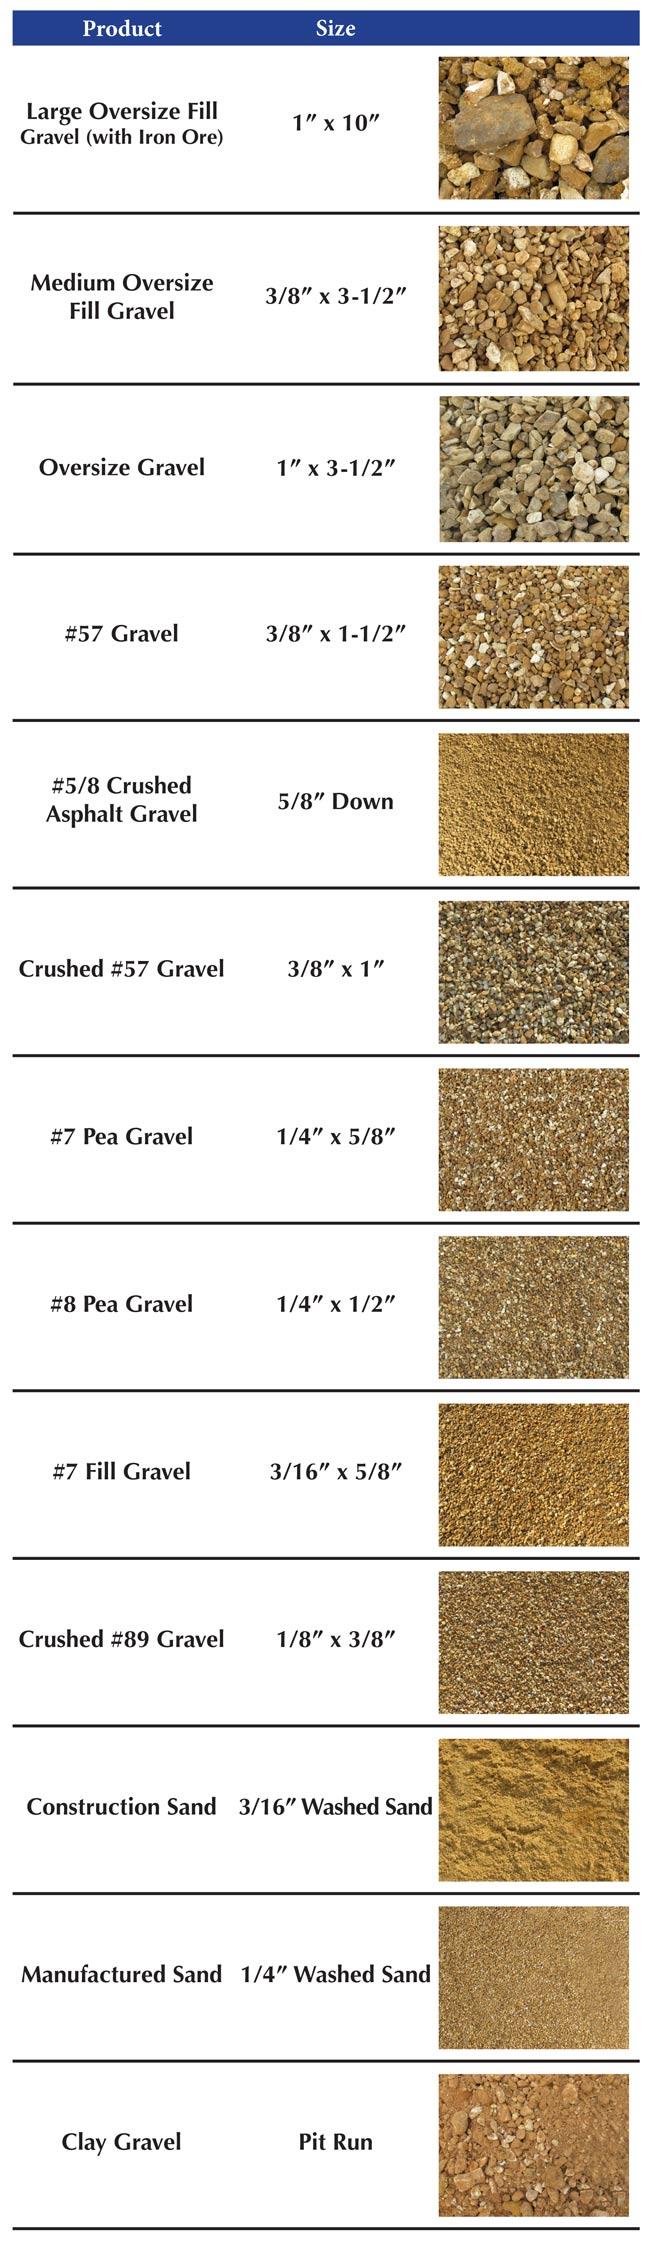 Shiloh Sand & Gravel Construction Products